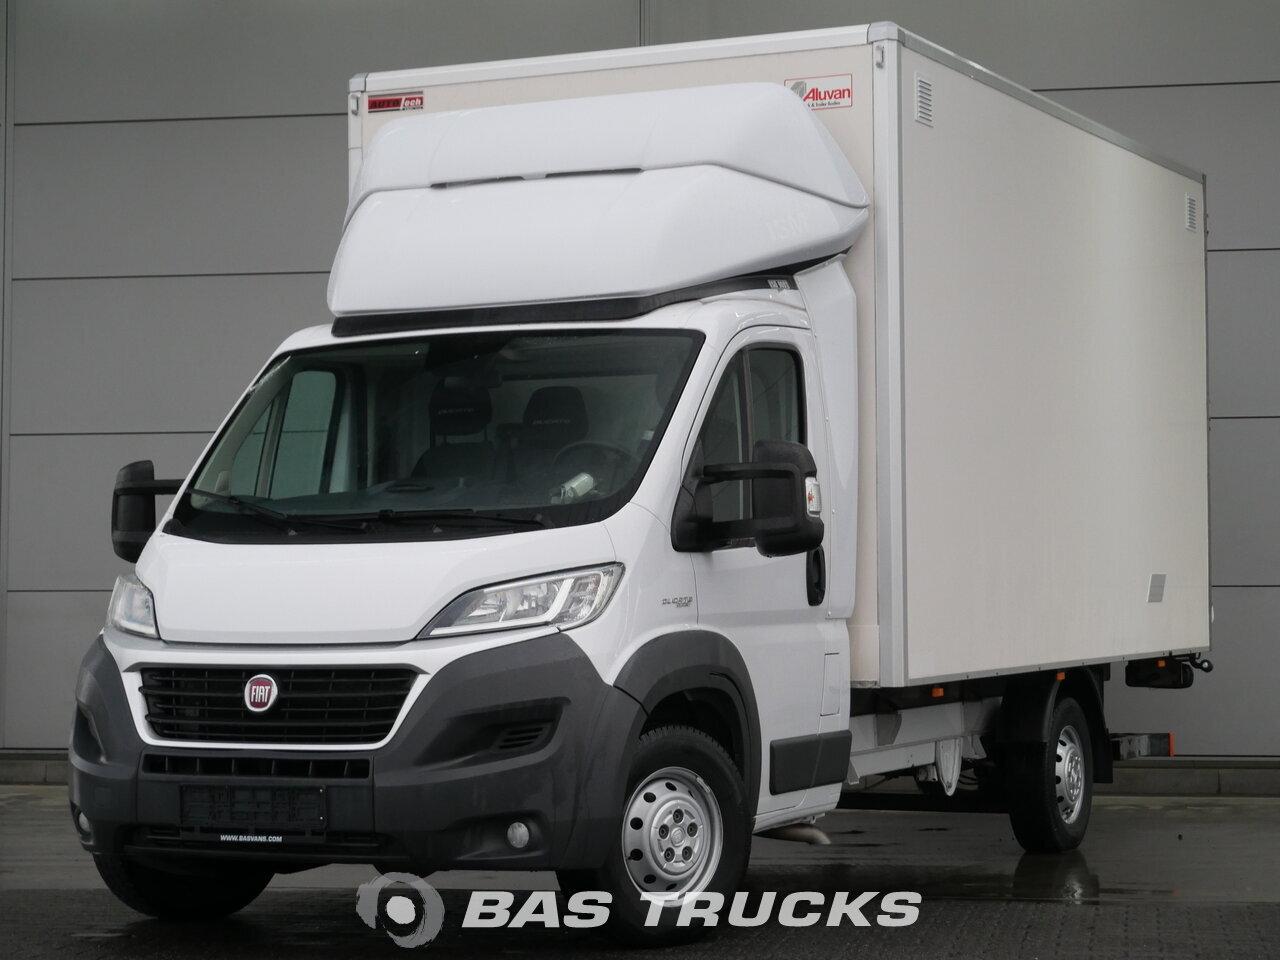 fiat ducato light commercial vehicle euro norm 0 22400. Black Bedroom Furniture Sets. Home Design Ideas